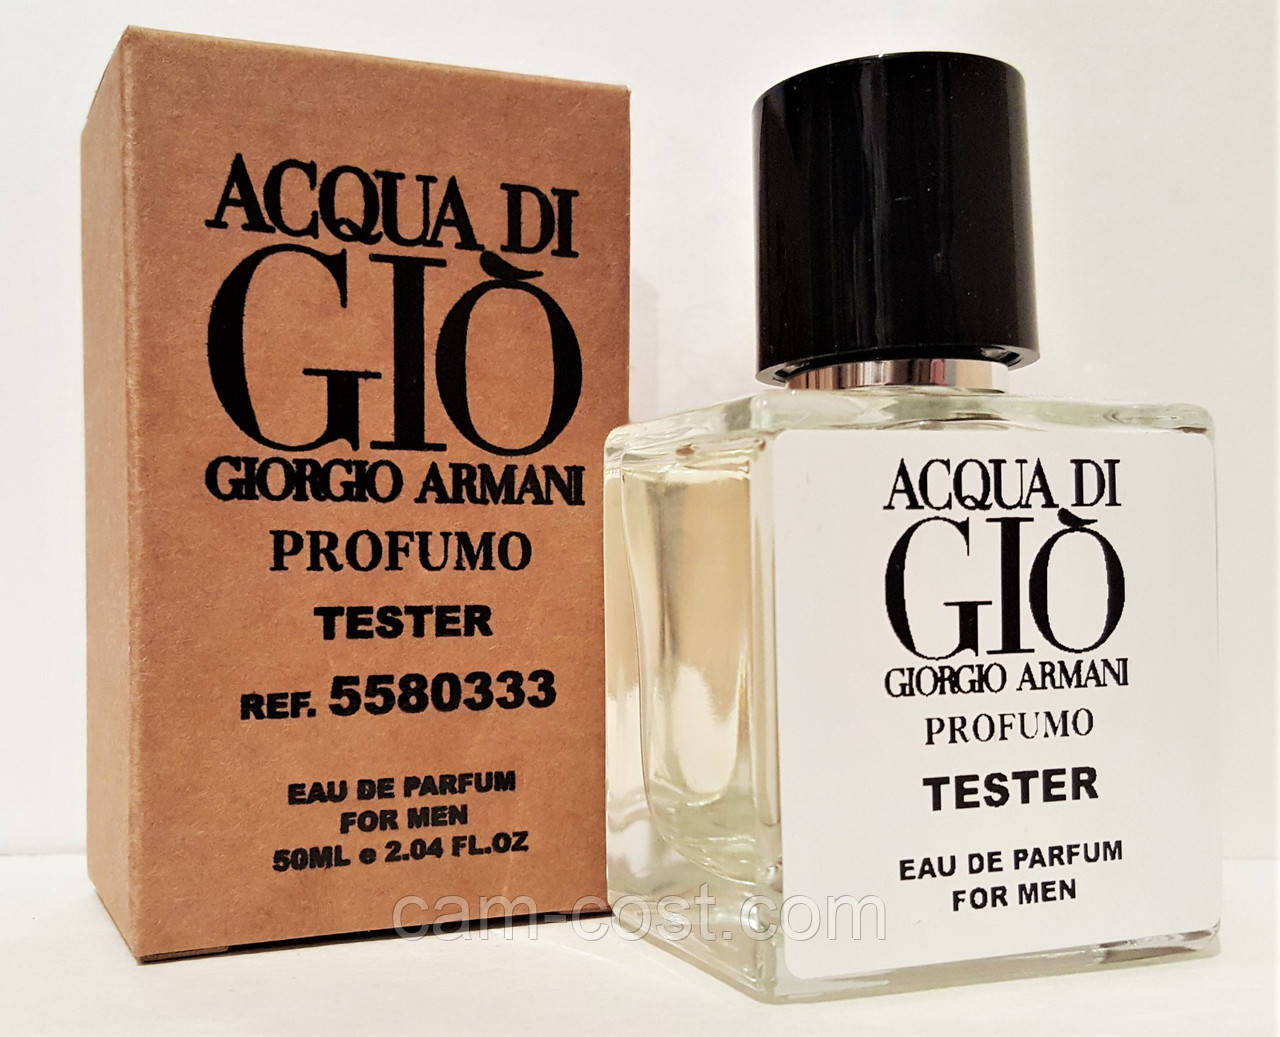 Парфюмированная вода в тестере Giorgio ARMANI Acqua di Gio PROFUMO 50 мл